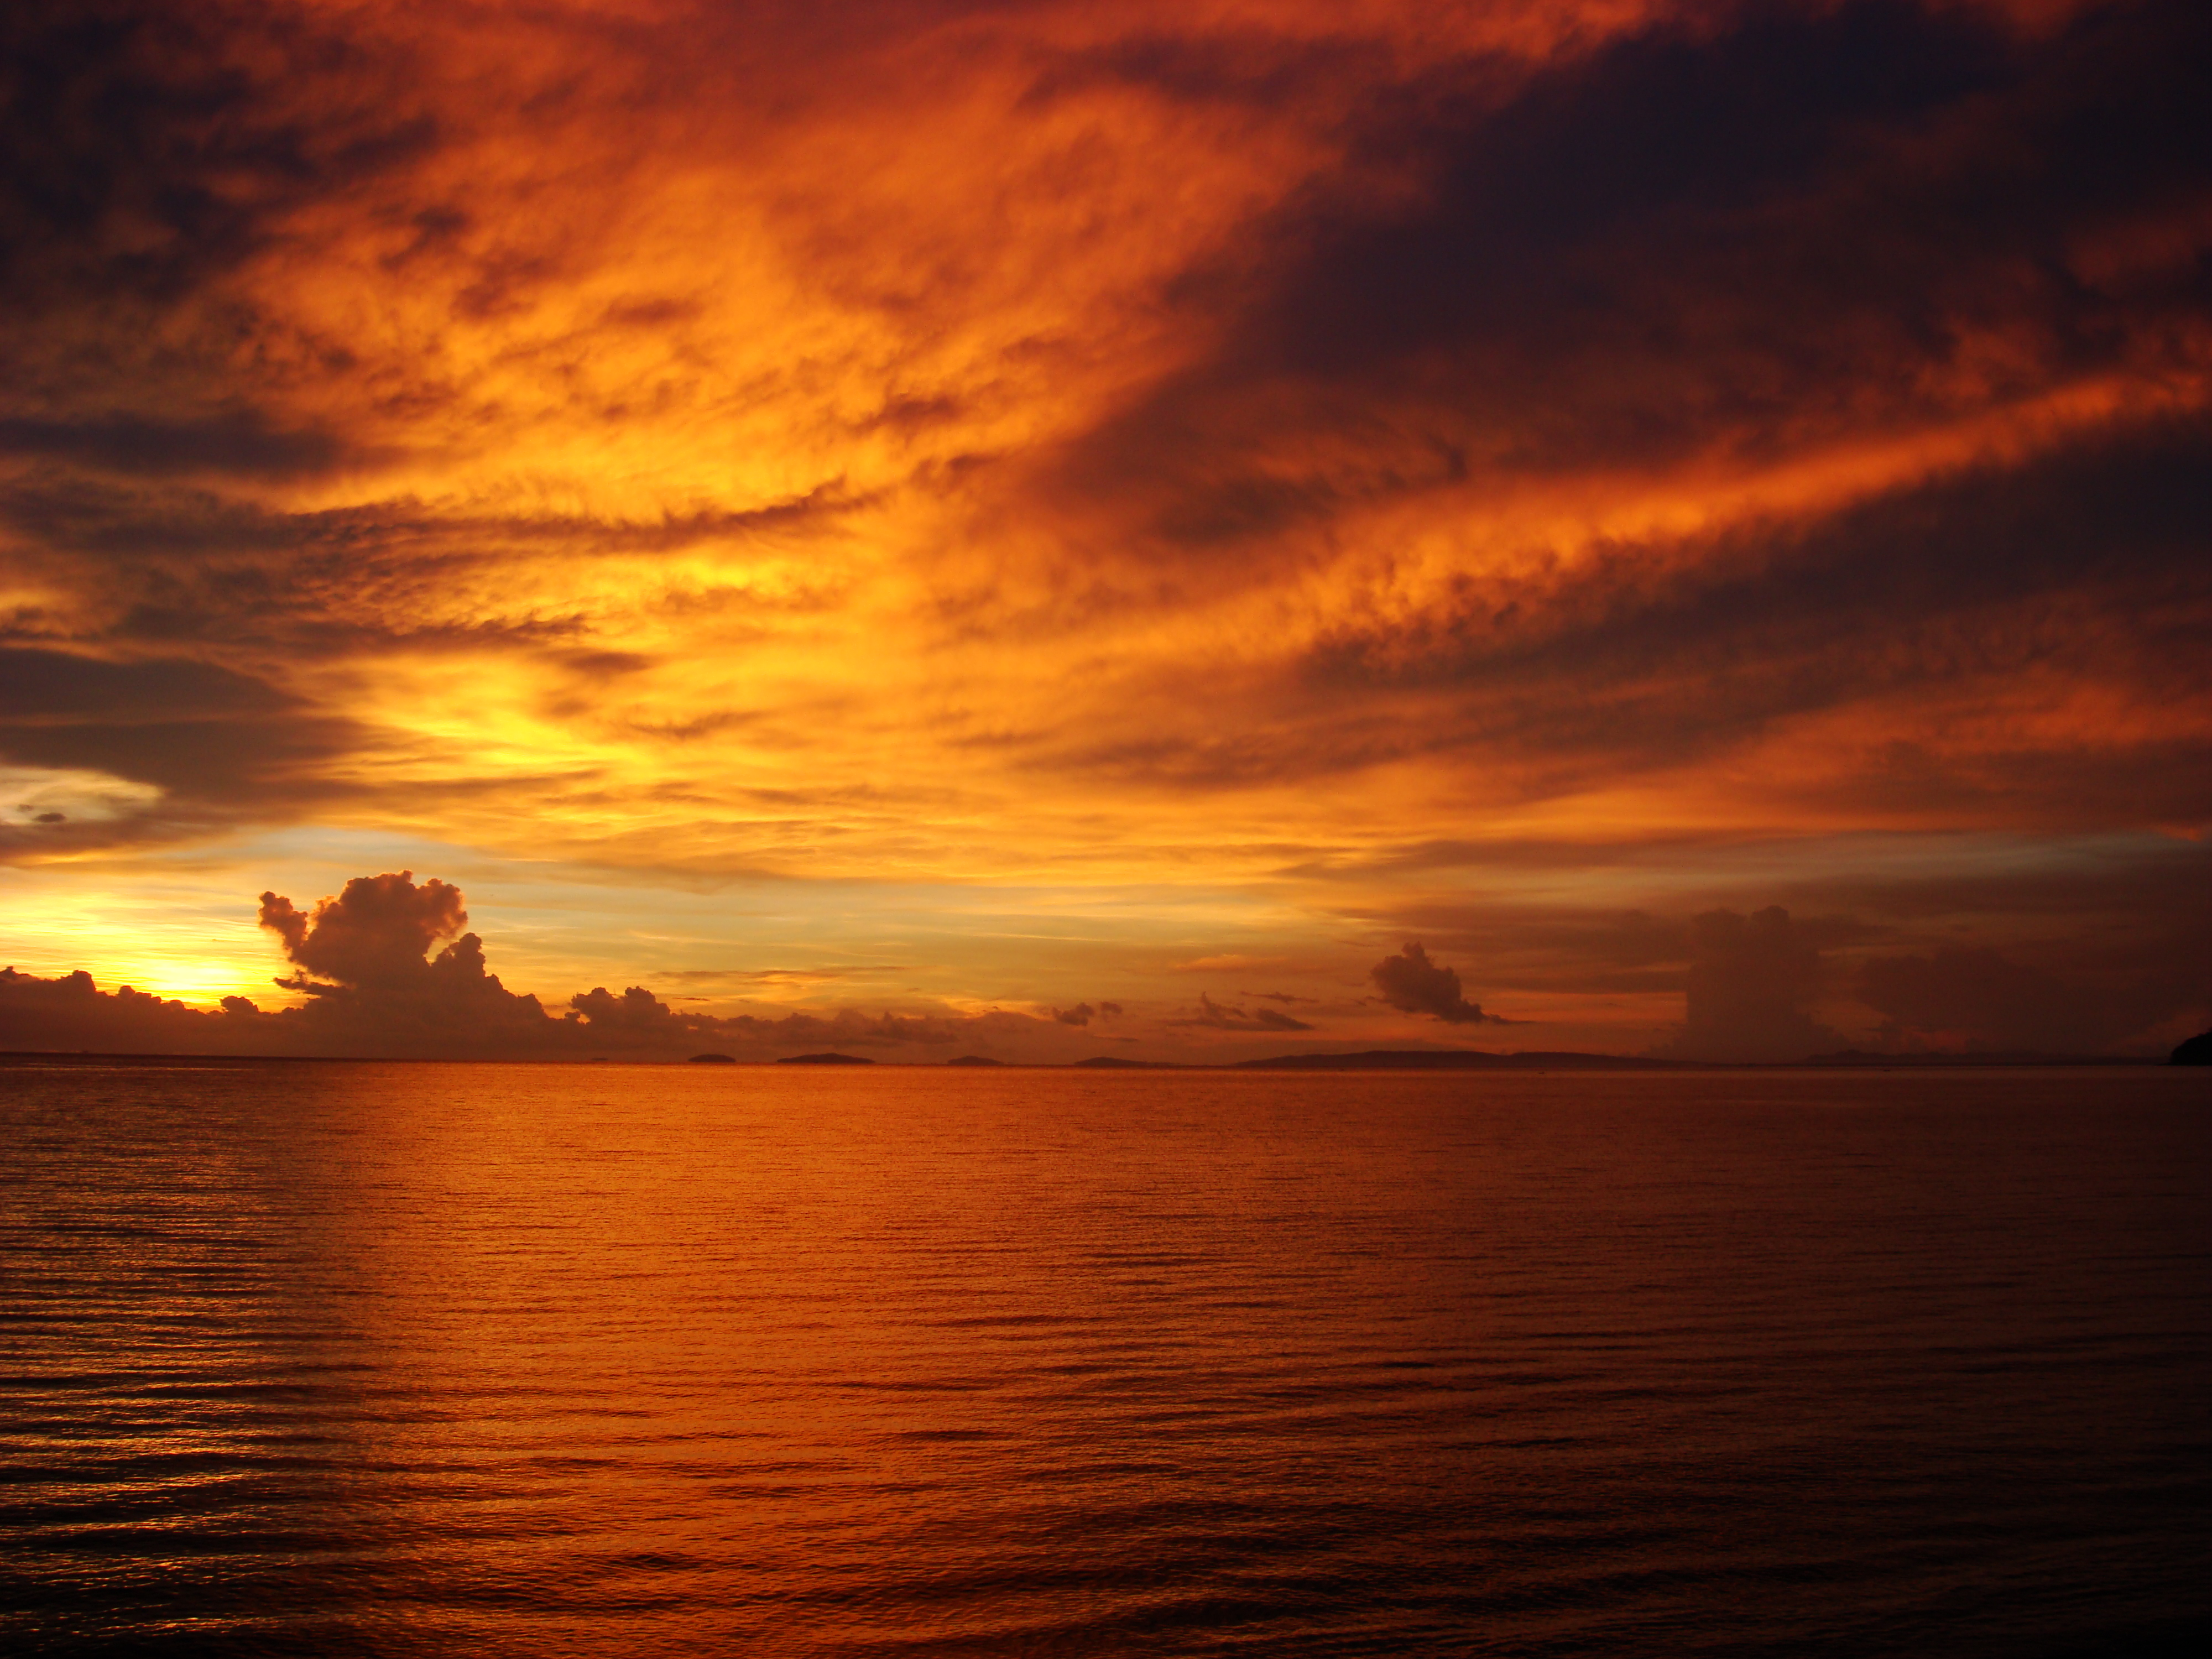 Sunrise Philippines Mindoro Island Tabinay 23